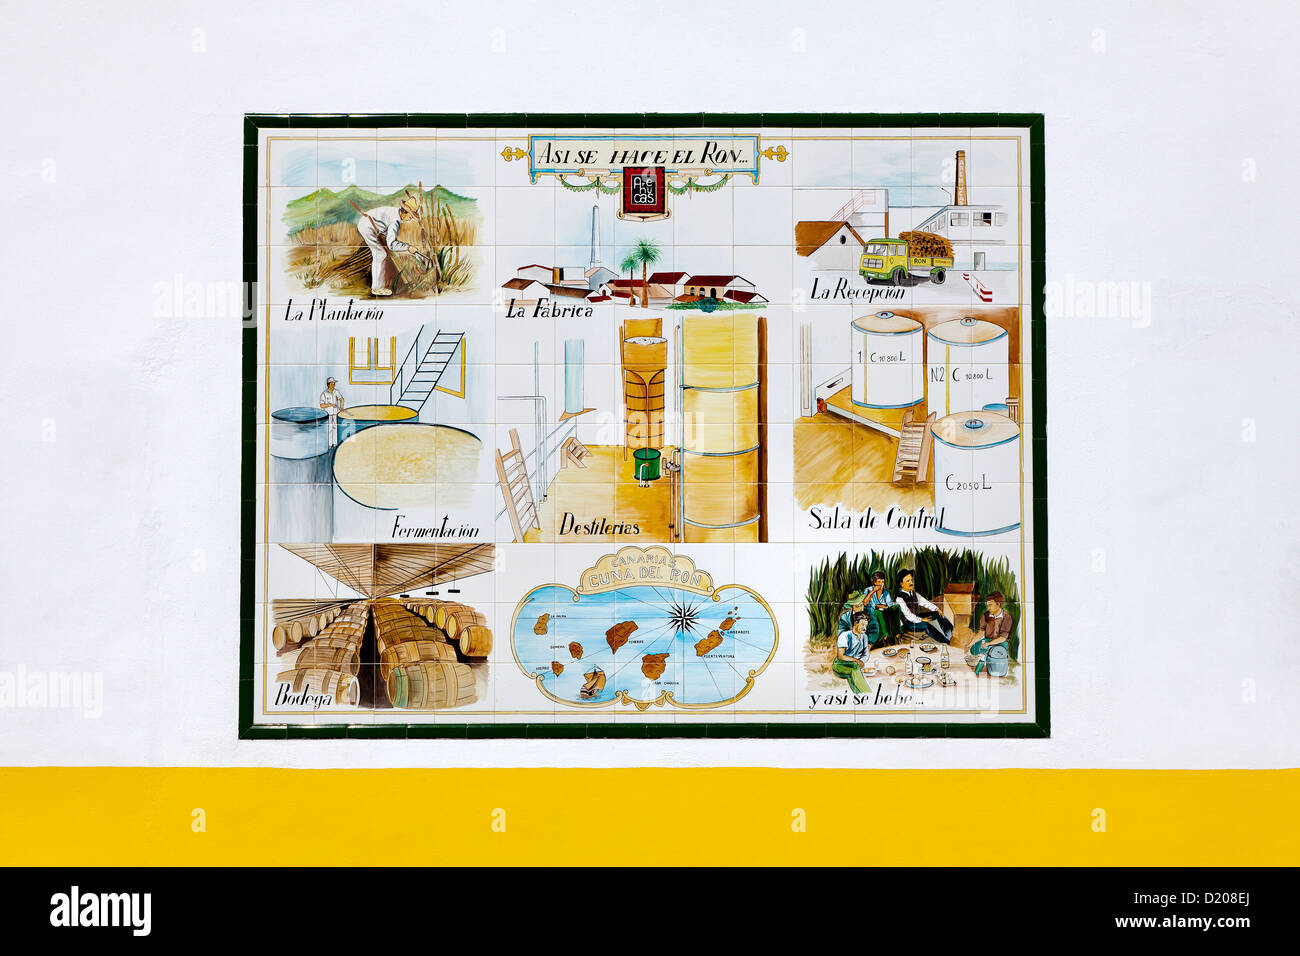 Tuile de production de rhum rhum Arehucas, photo, Arucas, Gran Canaria, Îles Canaries, Espagne Photo Stock